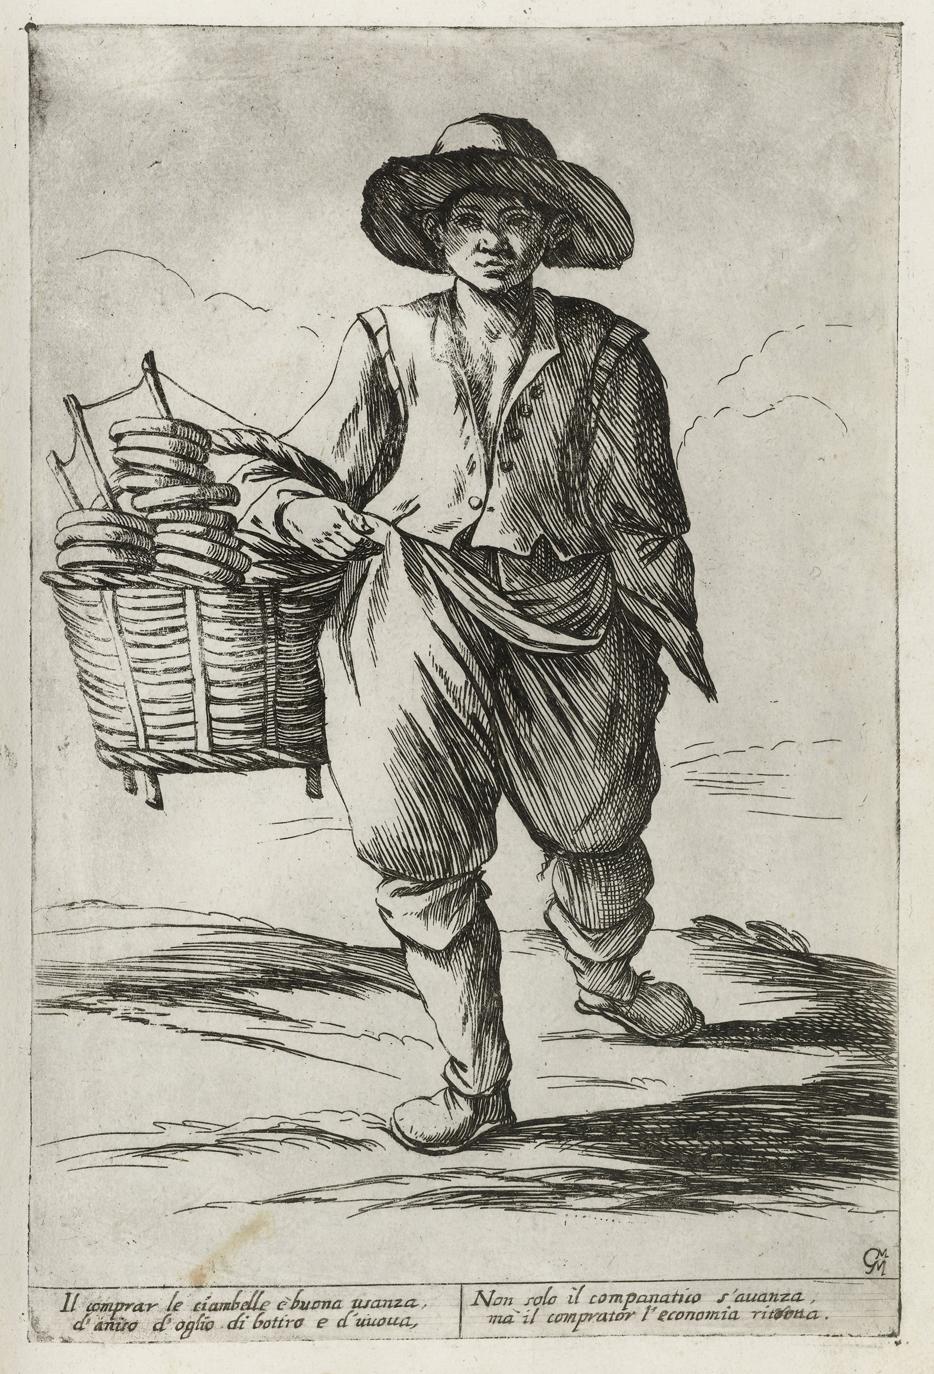 Ciambelle verkoper, Giuseppe Mitelli naar Annibale Carracci, 1660, Rijksmuseum